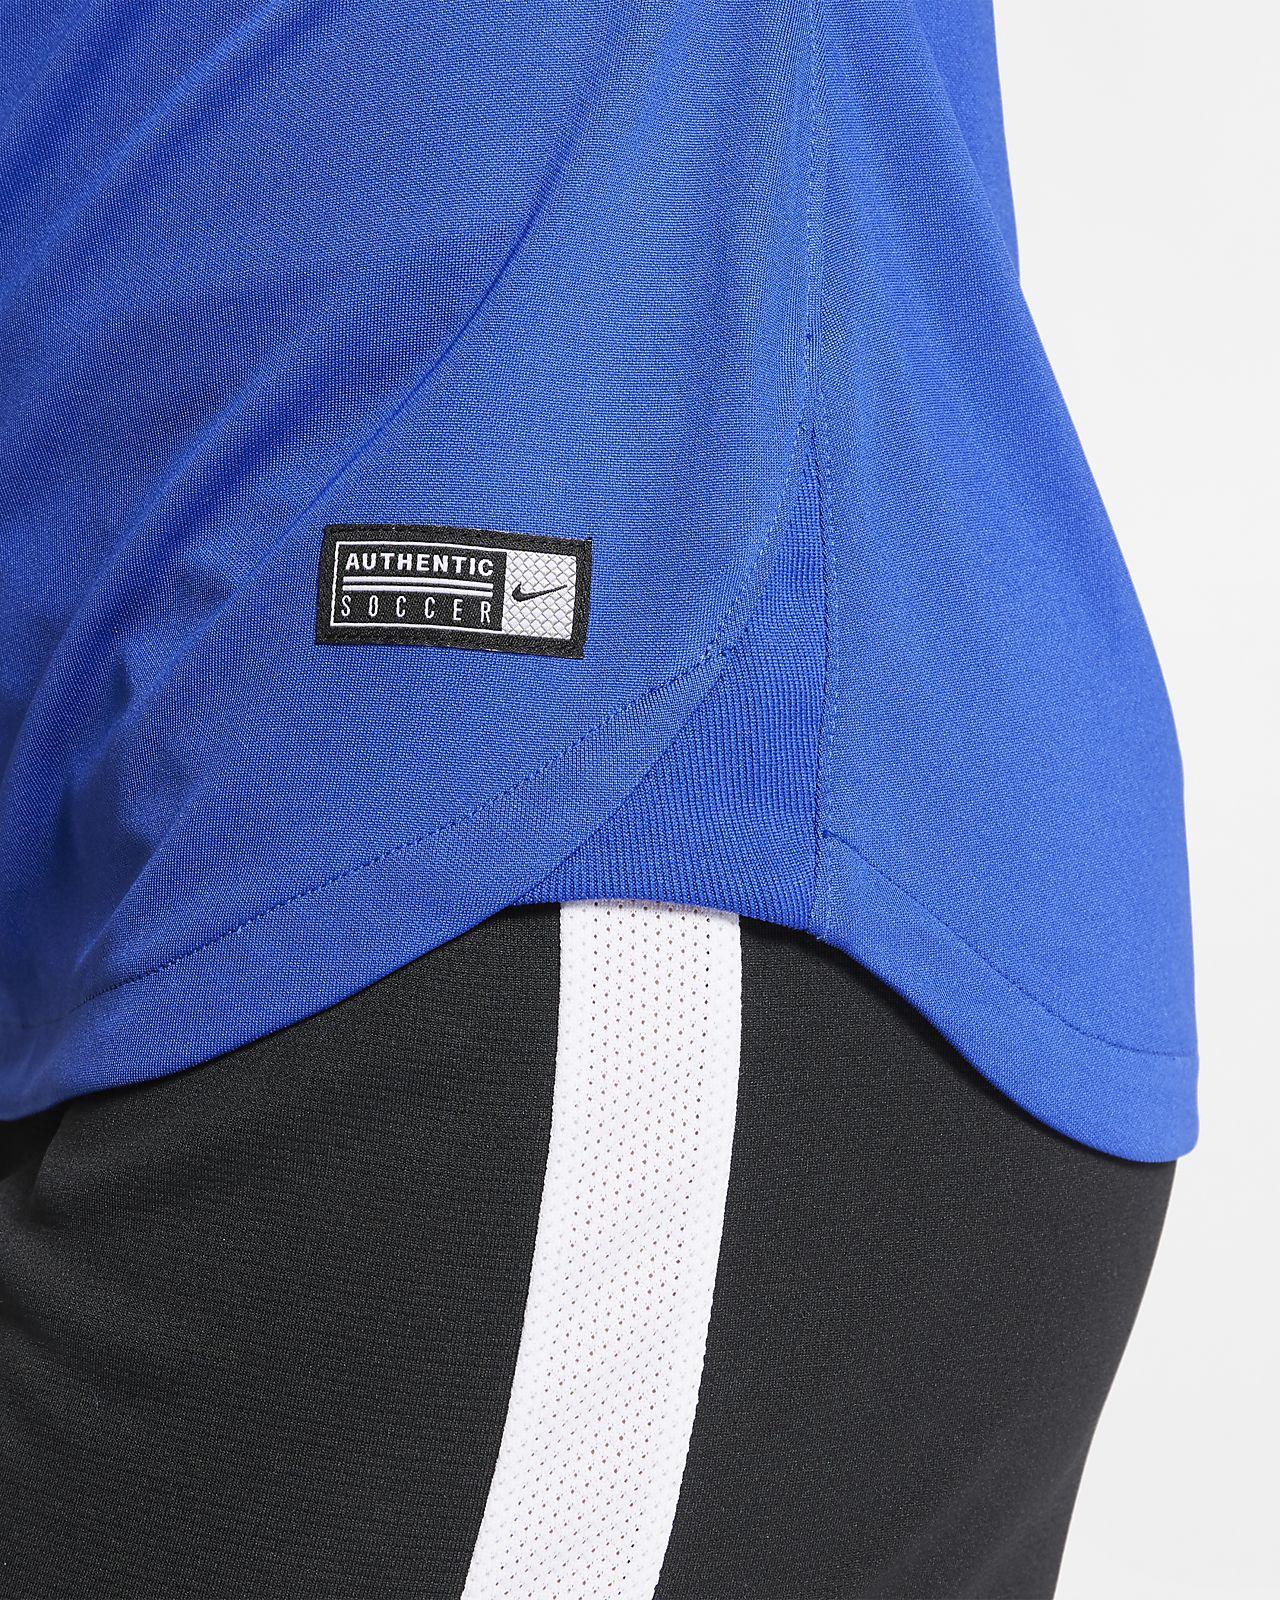 64830b1f71ef Nike Dri-FIT U.S. Squad Women s Short-Sleeve Soccer Top. Nike.com